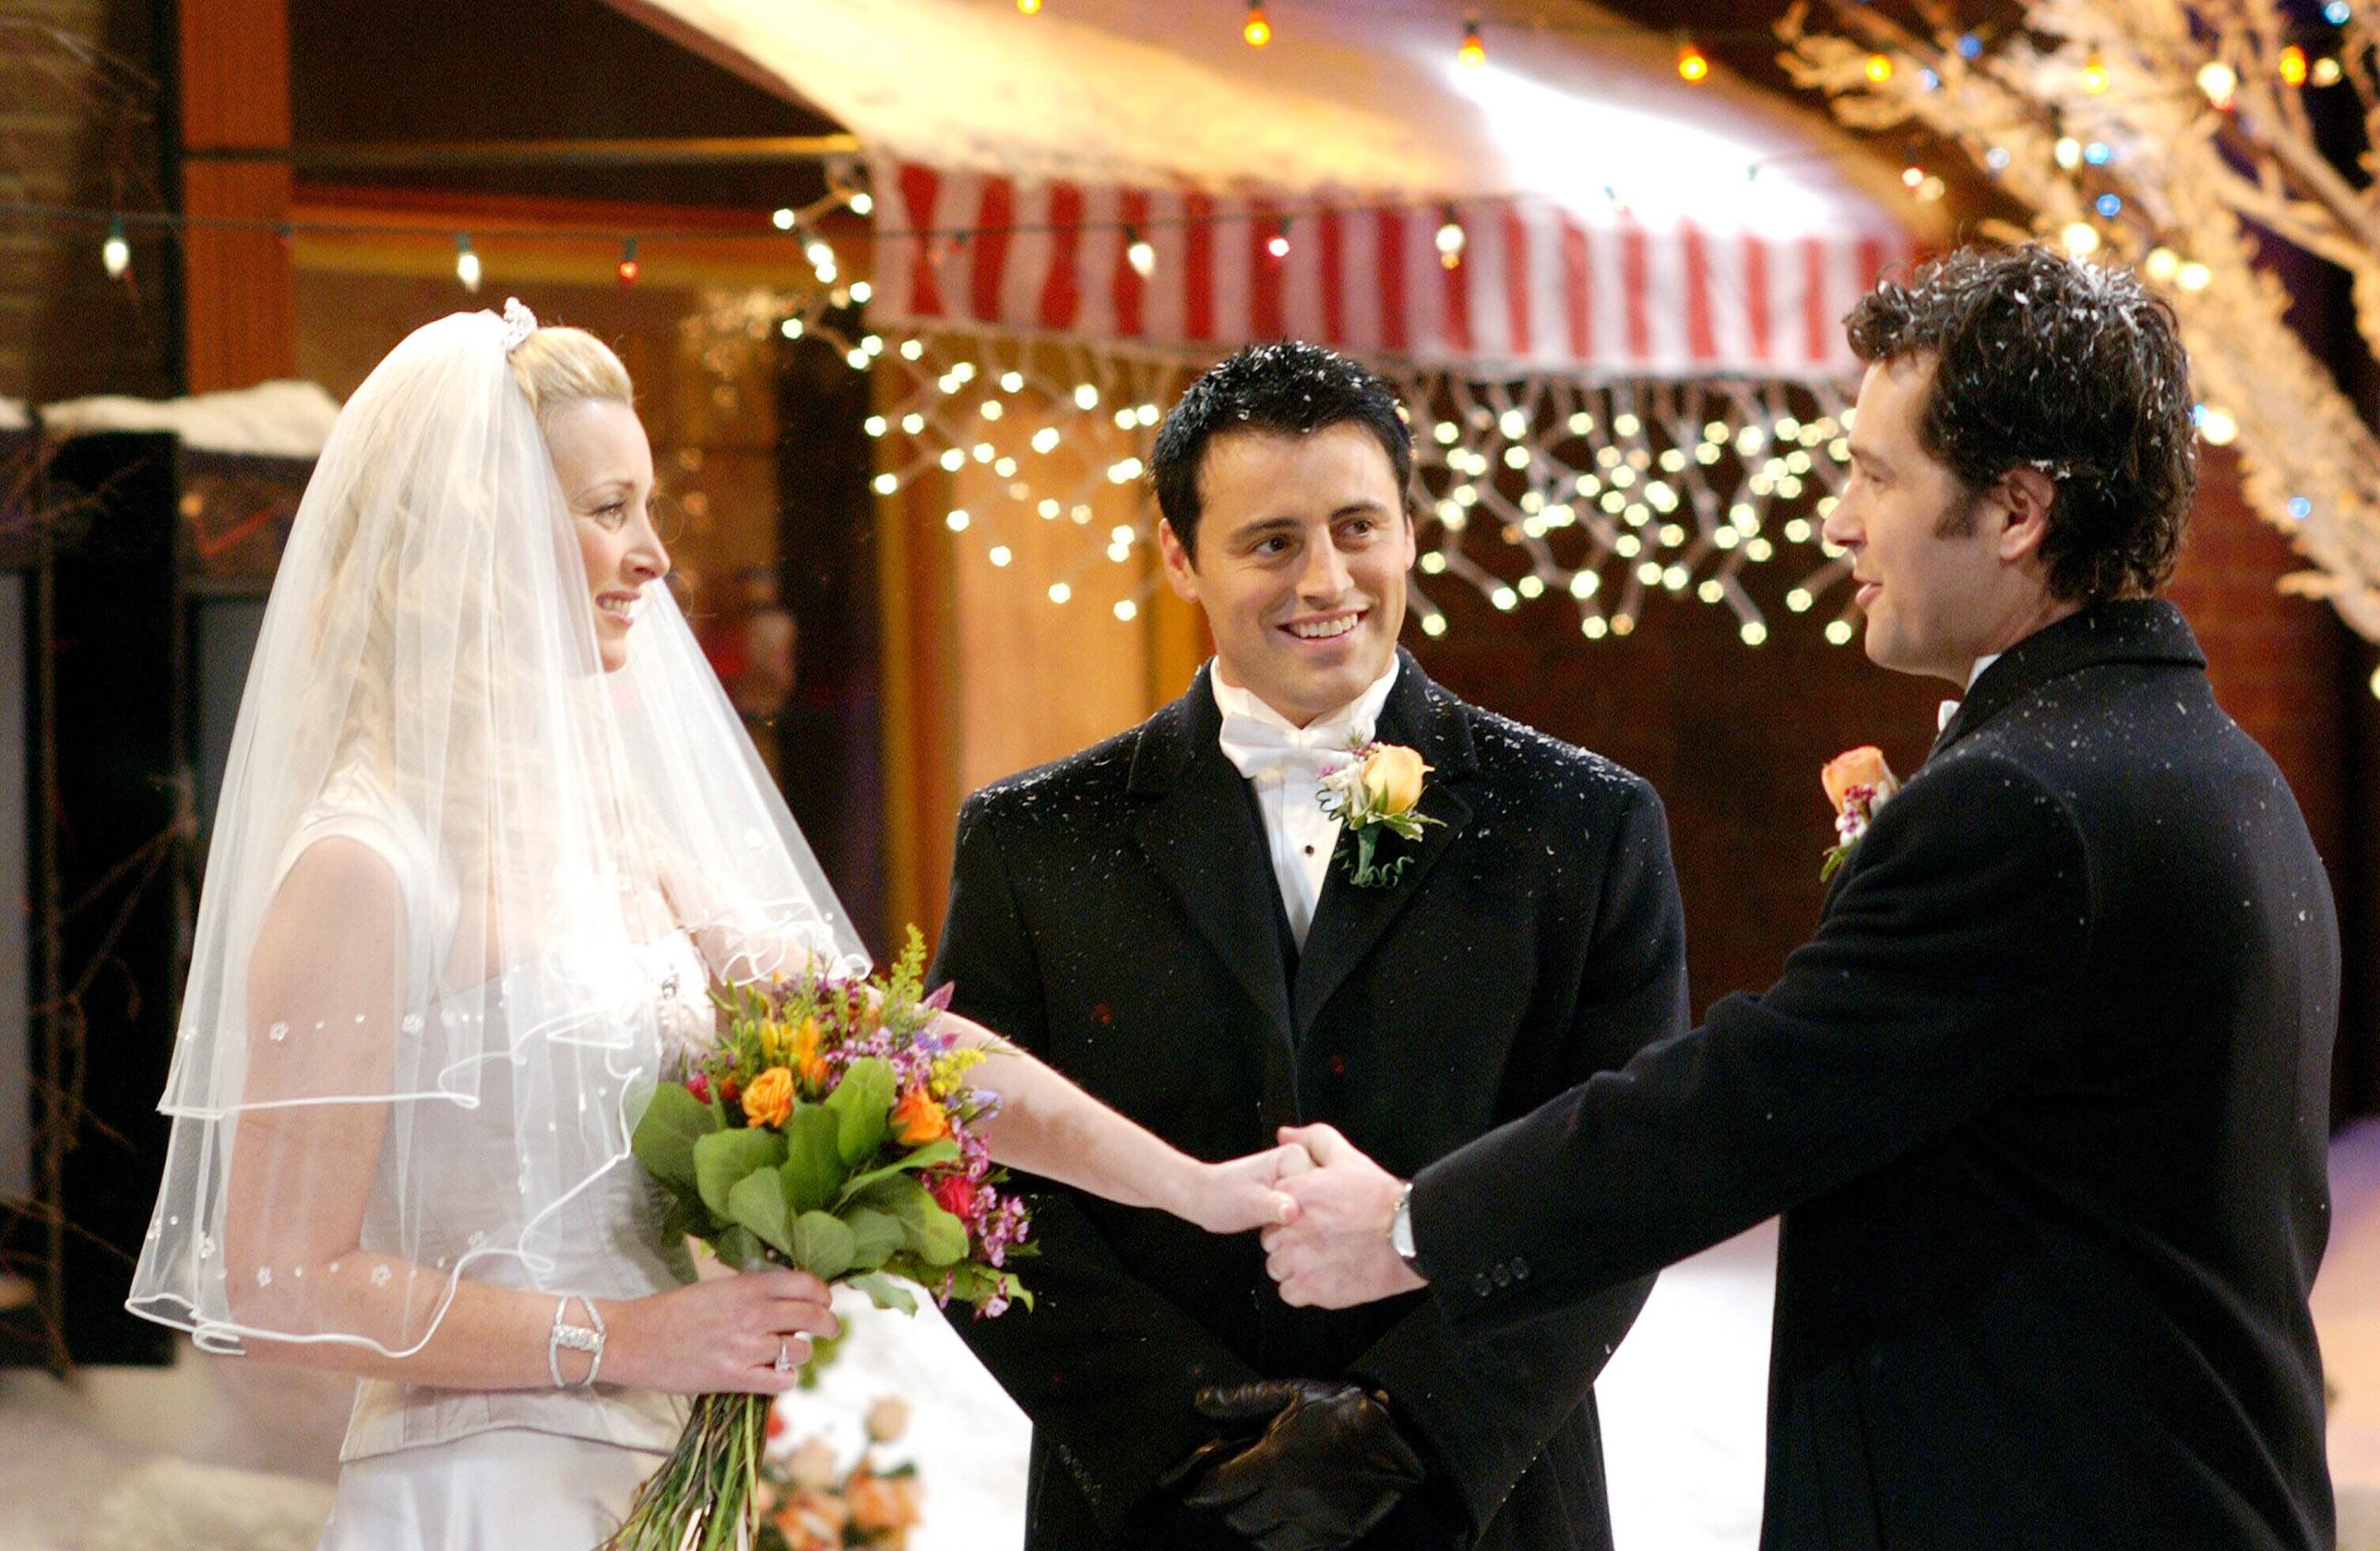 Phoebe (Lisa Kudrow) weds Mike (Paul Rudd) while Joey (Matt LeBlanc) officiates in a Season 10 episode of 'Friends' (Photo: Warner Bros. / Courtesy: Everett Collection)